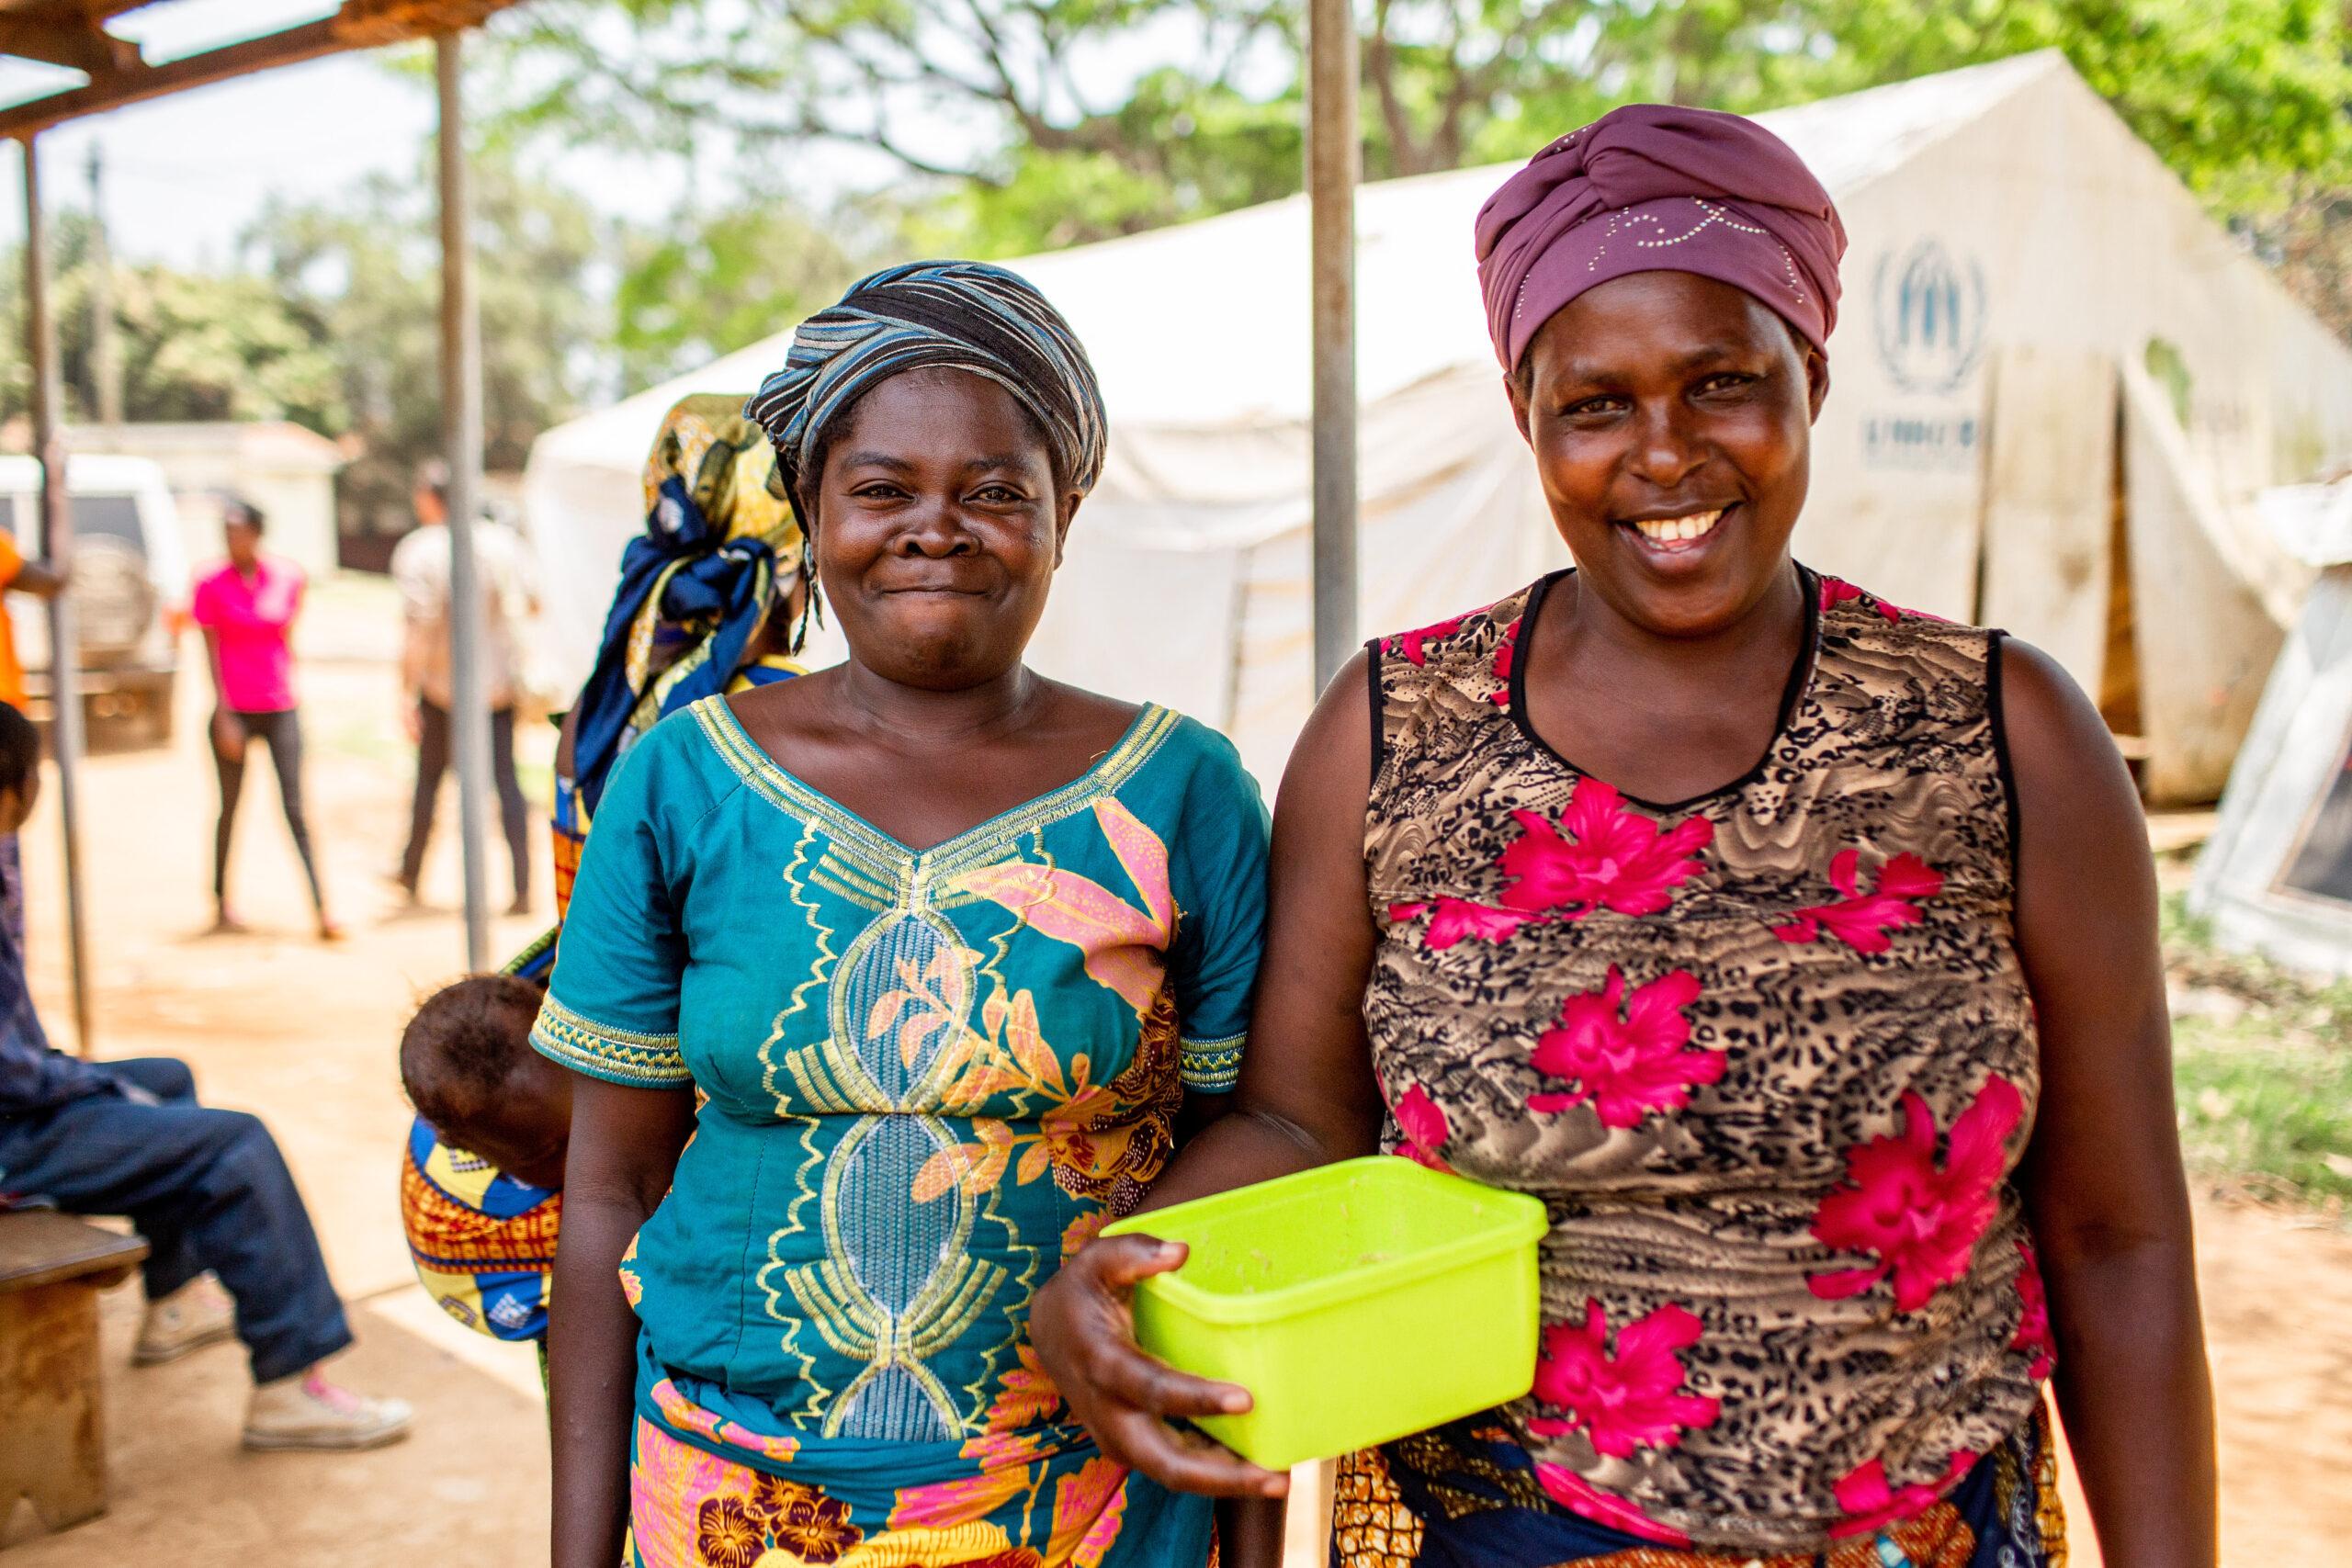 Women waiting outside the maternal and child health ward in Kyangwali, Uganda